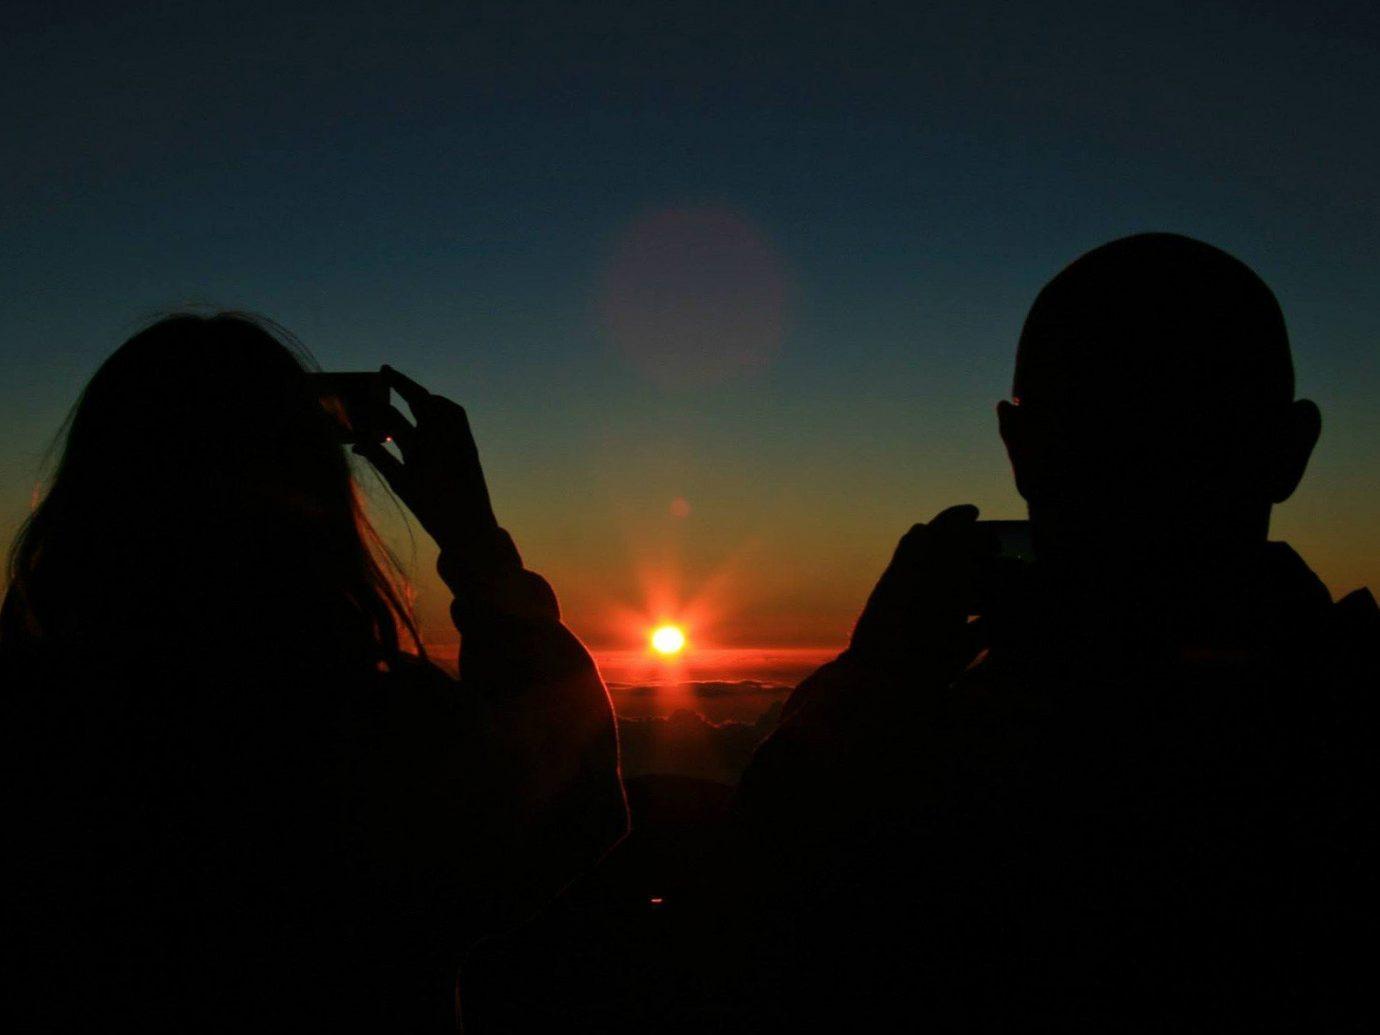 Offbeat person dark laptop atmospheric phenomenon looking Sunset atmosphere darkness light night silhouette atmosphere of earth sunrise morning evening dawn dusk watching sunlight Sun staring